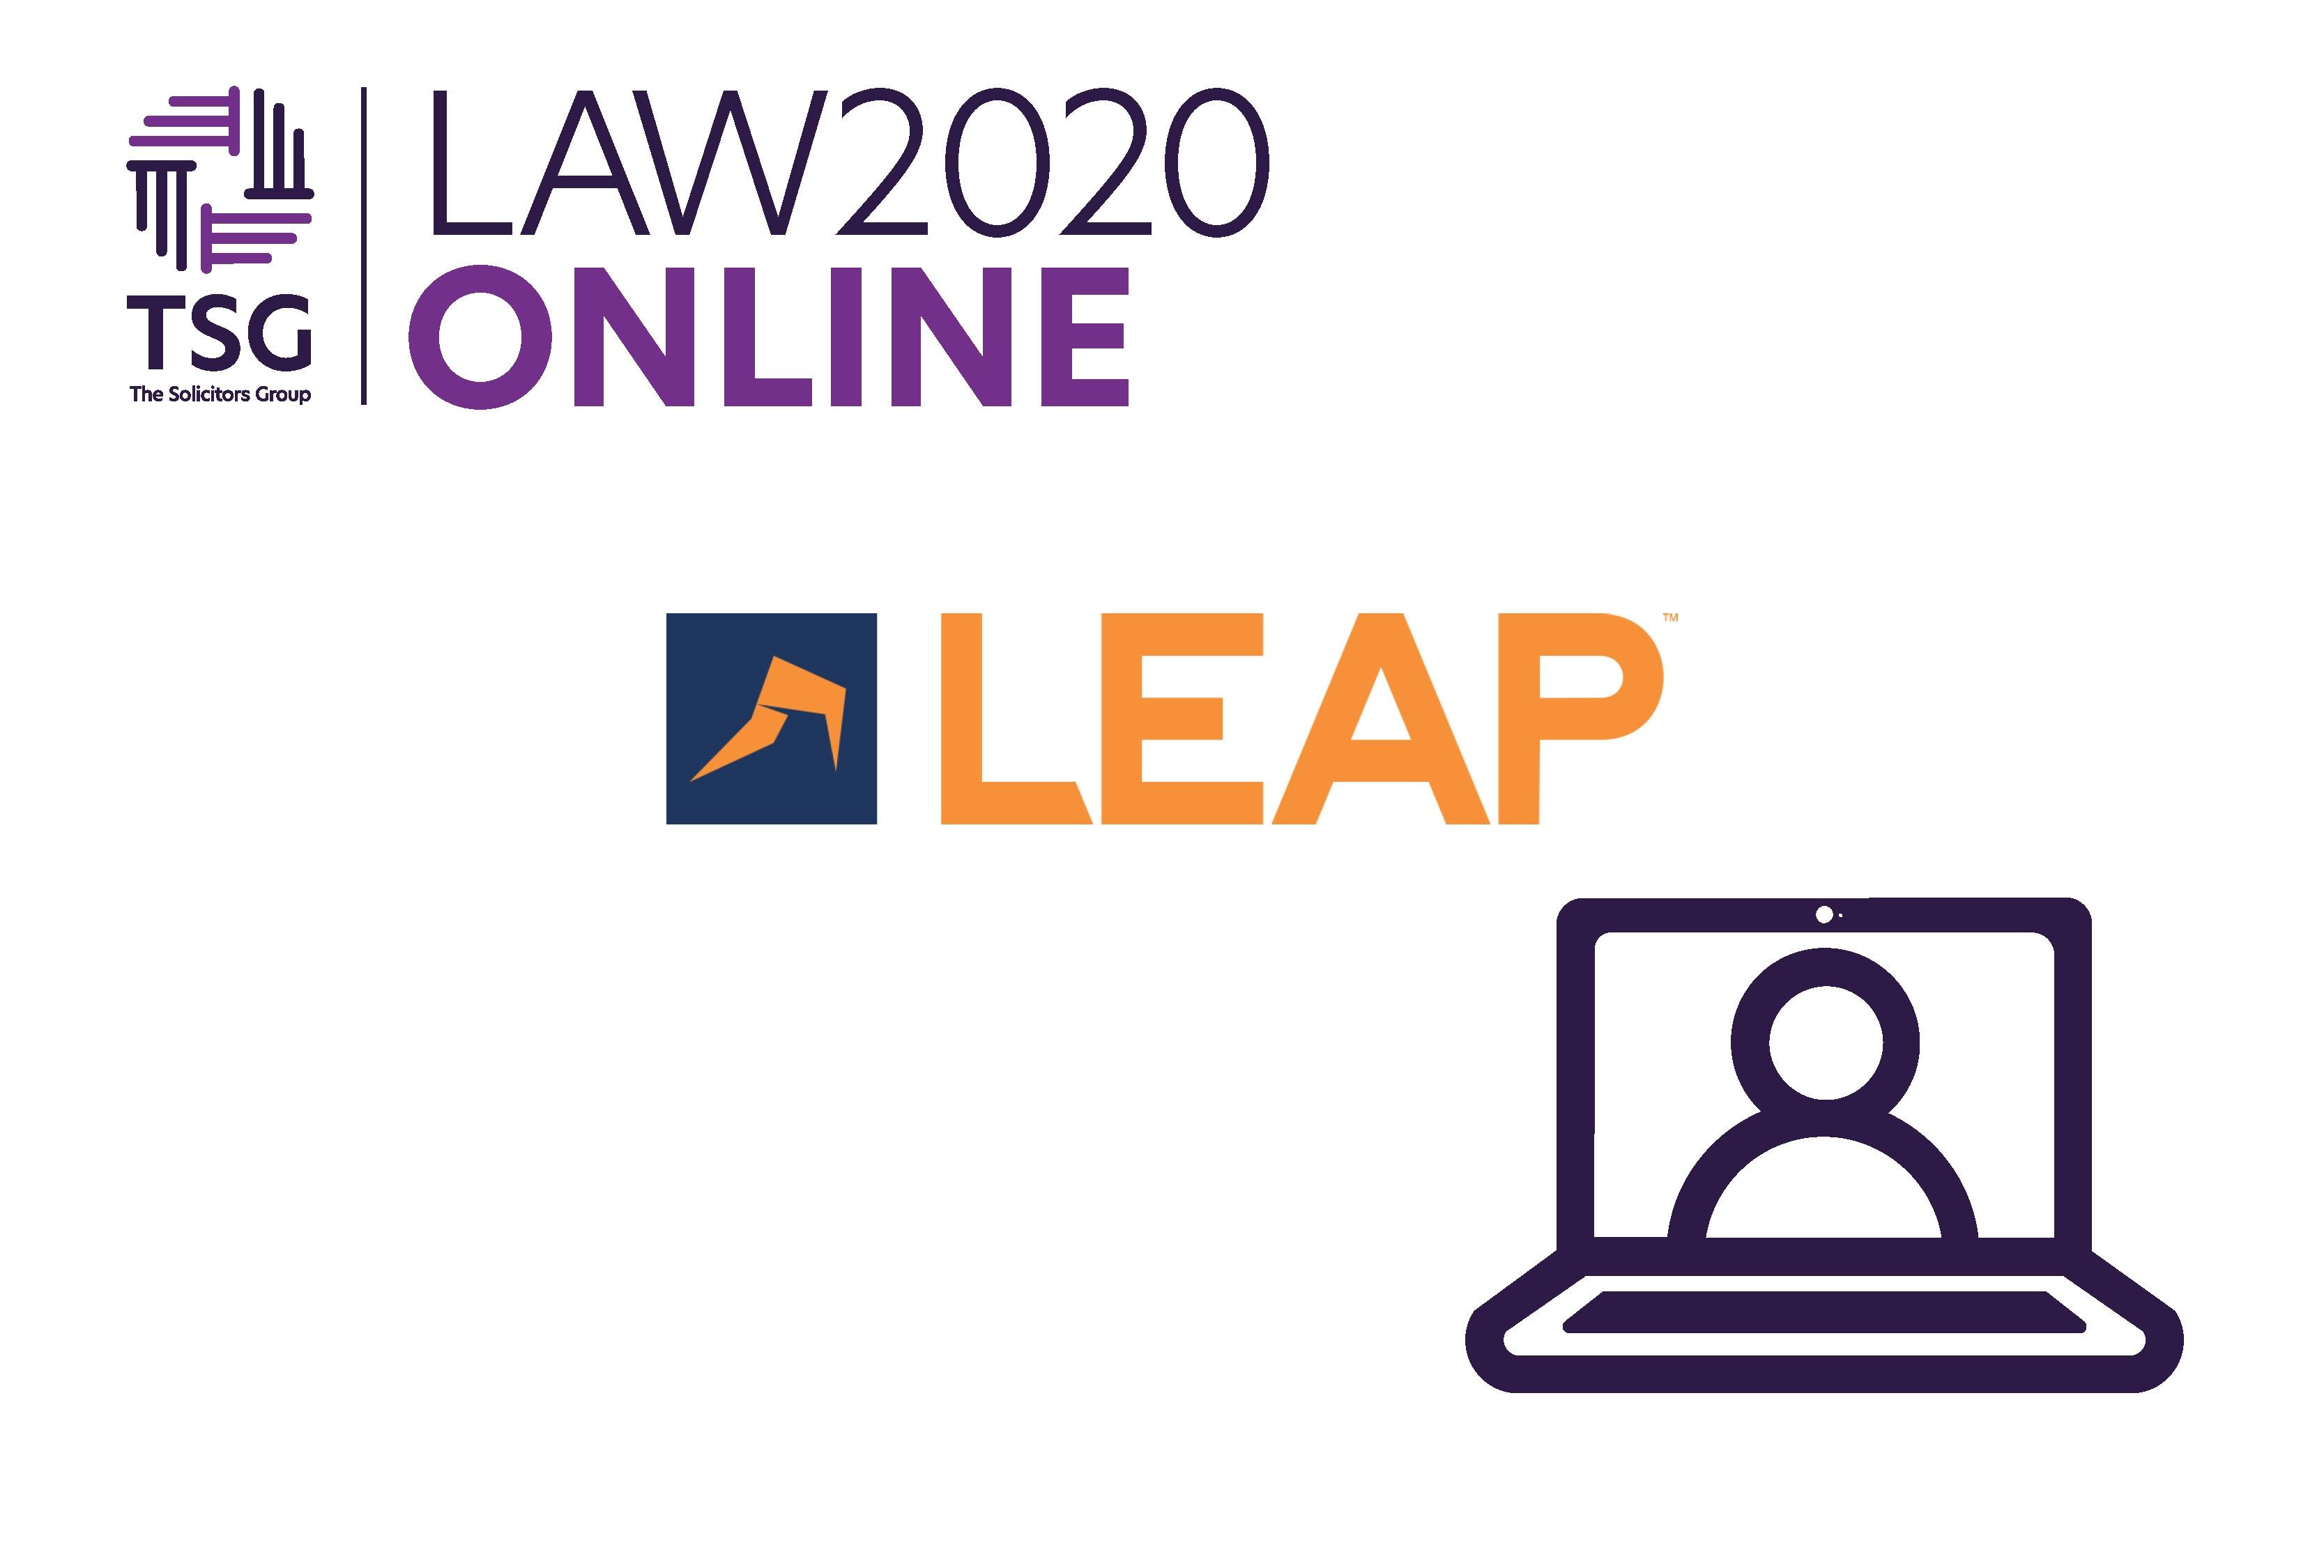 LEAP LAW2020 Online